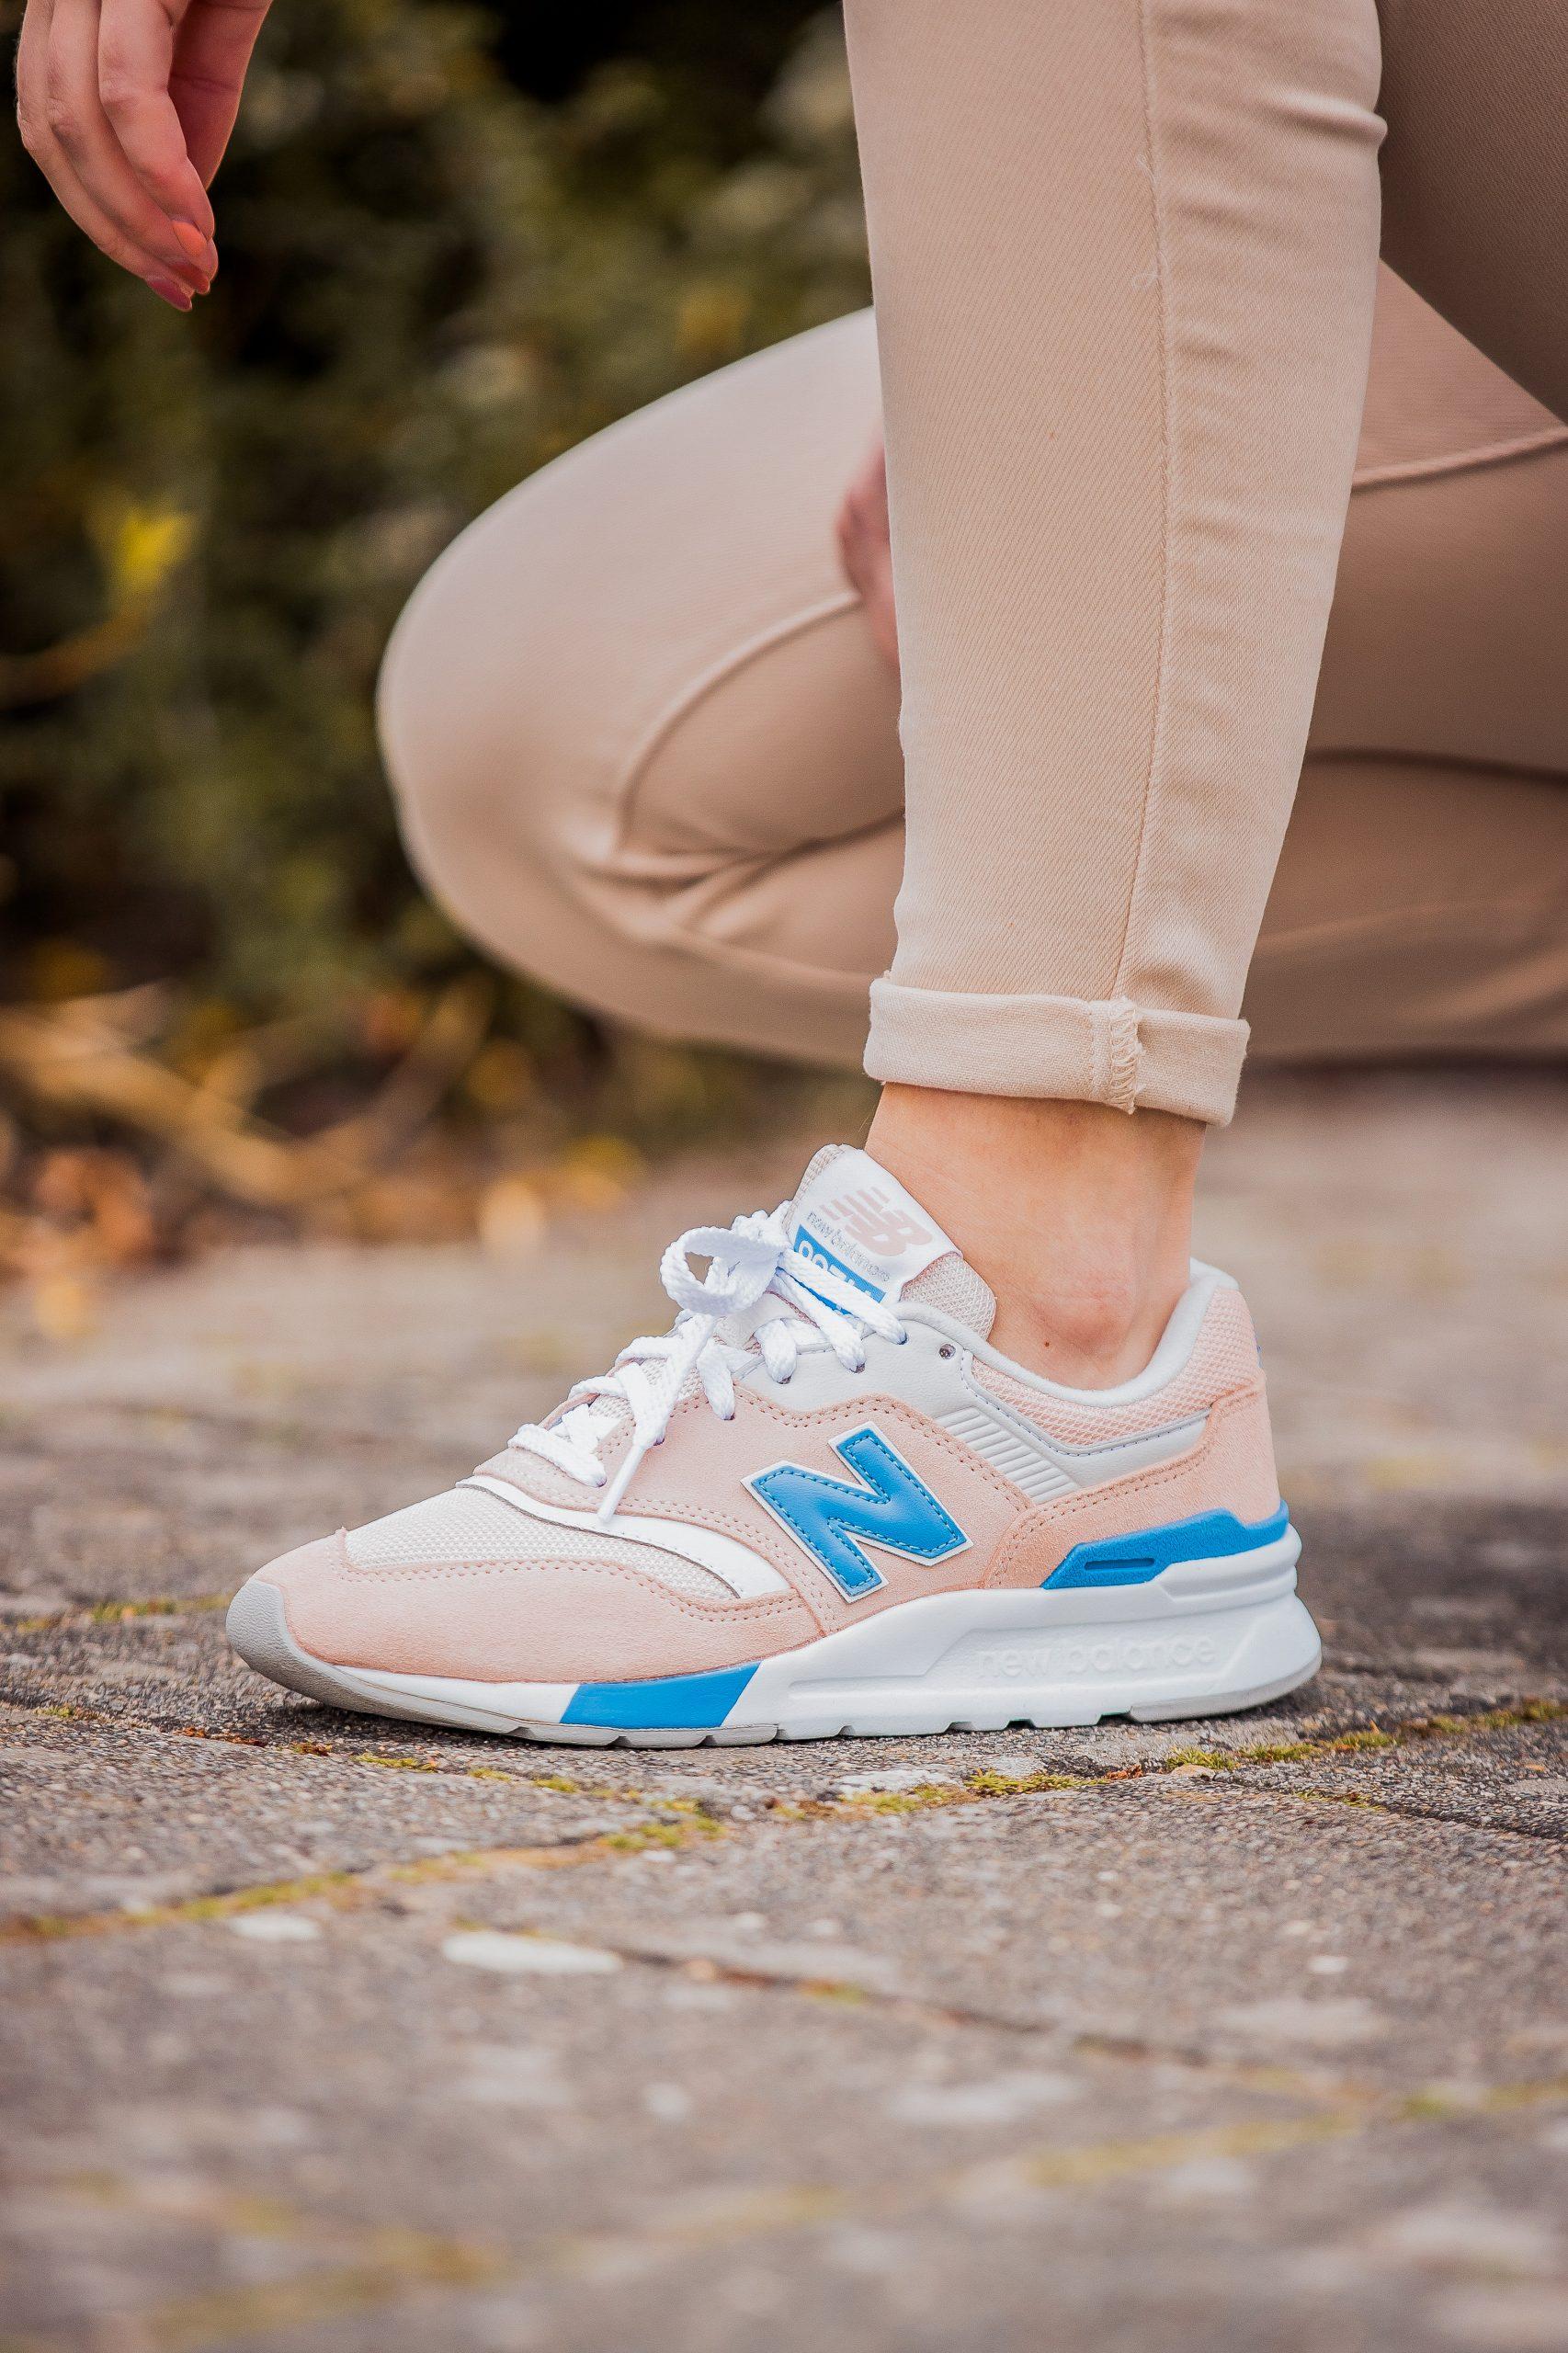 new balance, sneakers, sport, sportschoen, plutosport, unisex, his, hers, xmariekie, blog, blogger, influencer